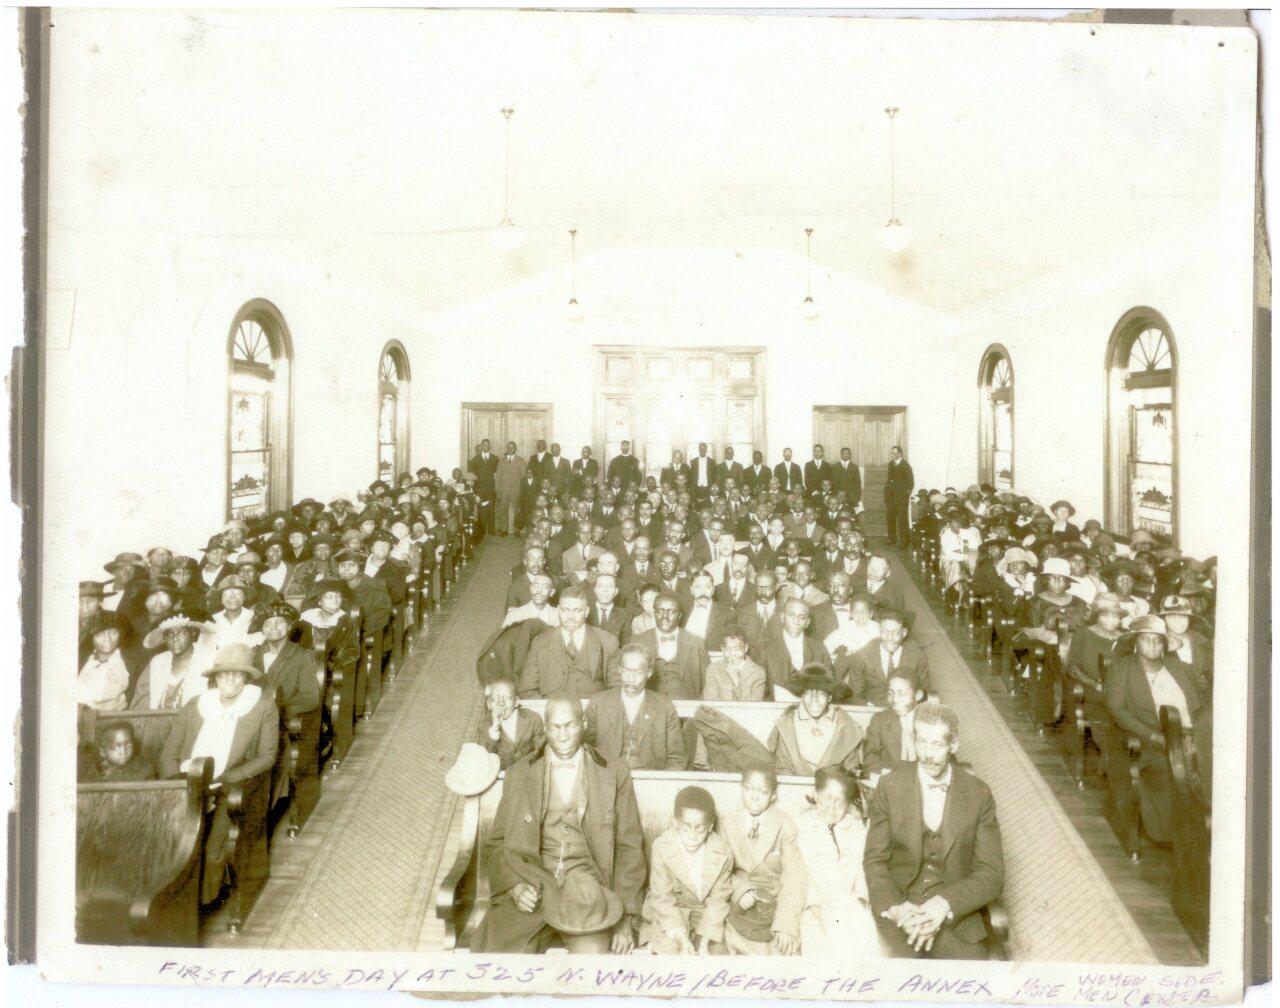 Mt. Zion Baptist Church_Woodlawn_First Mens day MZBC.jpg